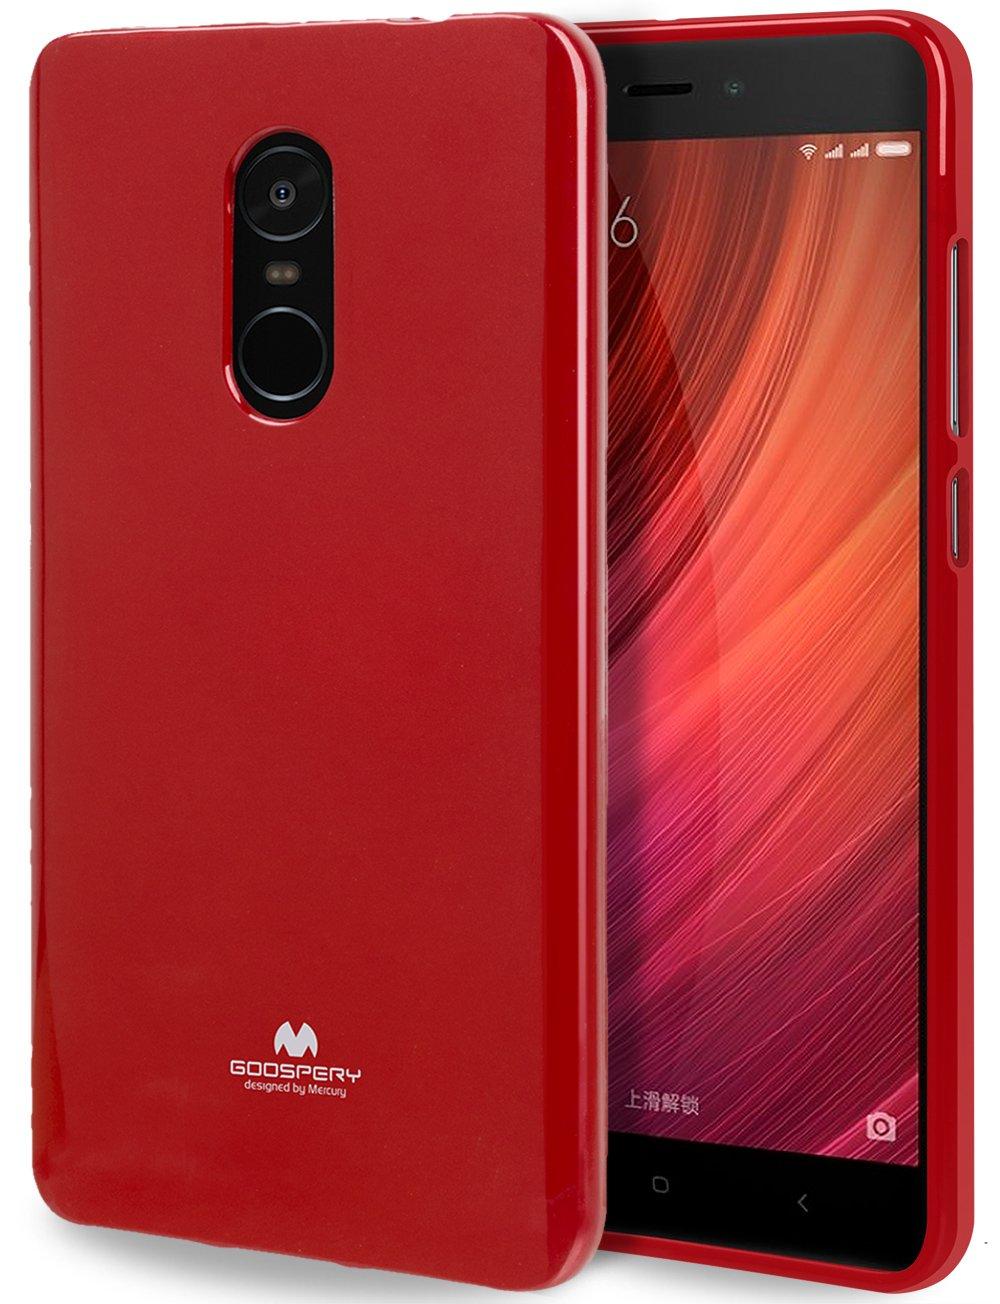 Harga Dan Spek Obral Goospery Xiaomi Redmi S2 Blue Moon Flip Case Mercury Bluemoon Cover Note 4 Hitam Marlang 4x Red Mint Free